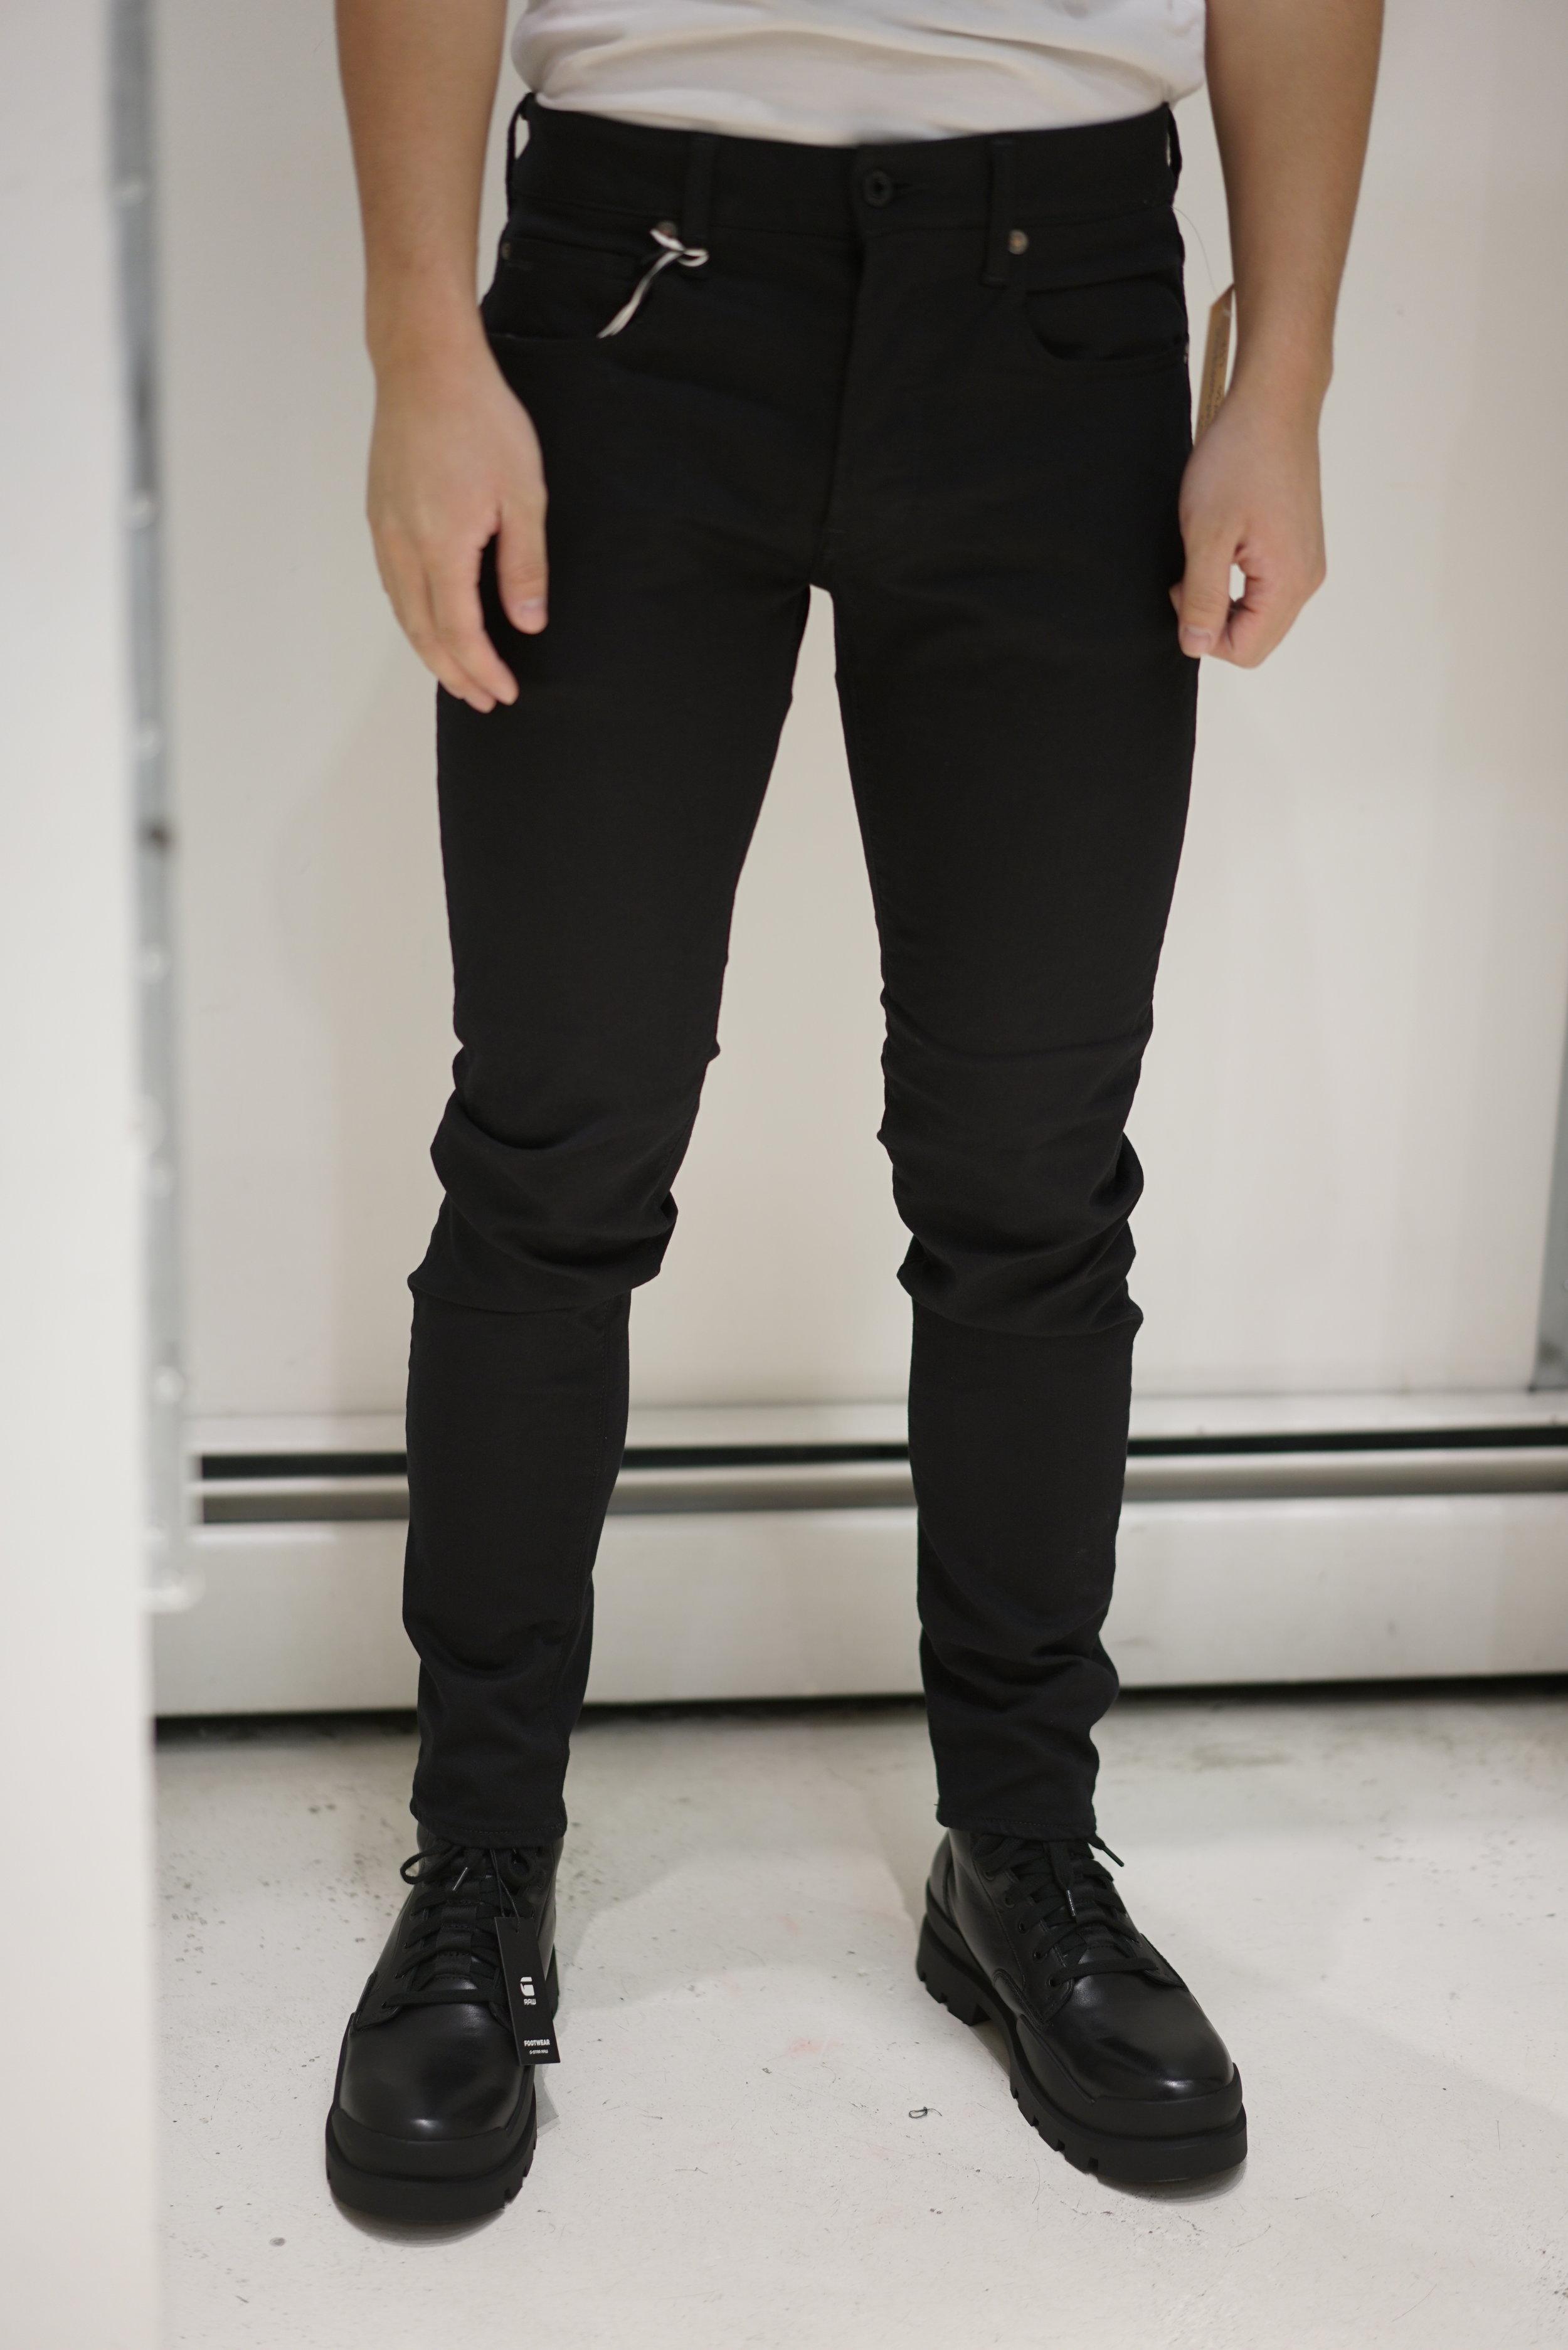 d9155a9ba998 G-Star Raw 3301 Slim Jeans - Rinsed — global atomic designs inc